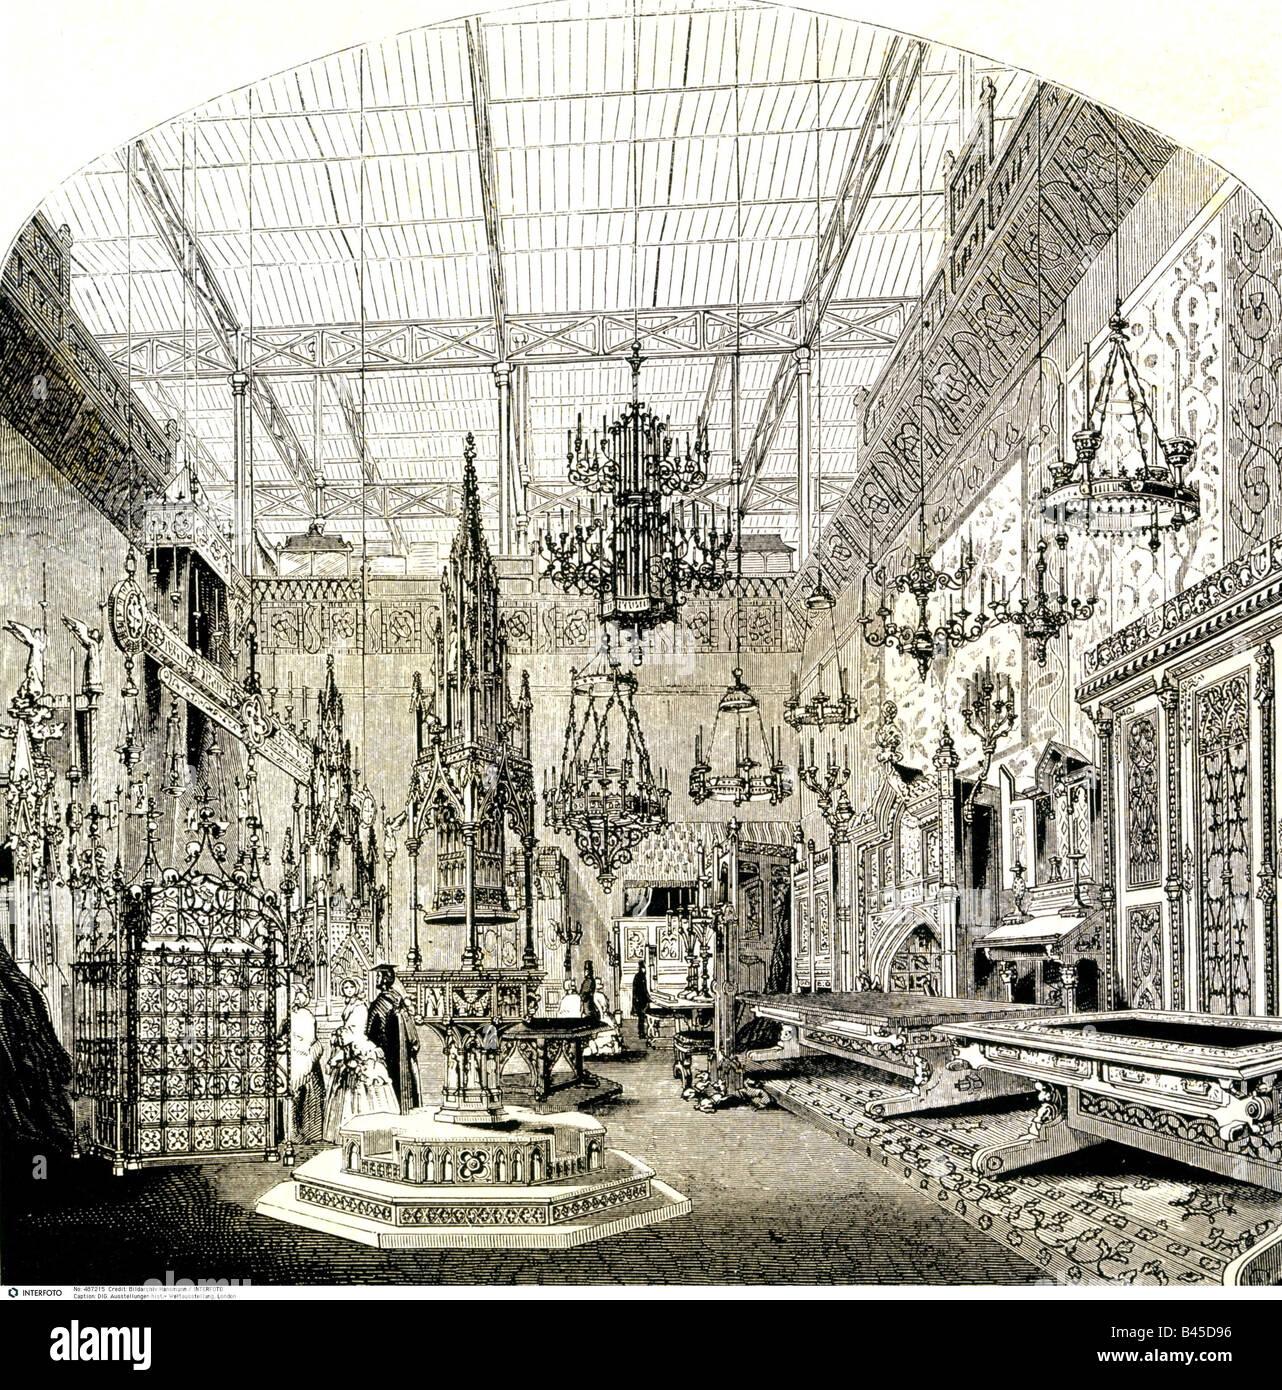 D Exhibition London : Medieval court stock photos images